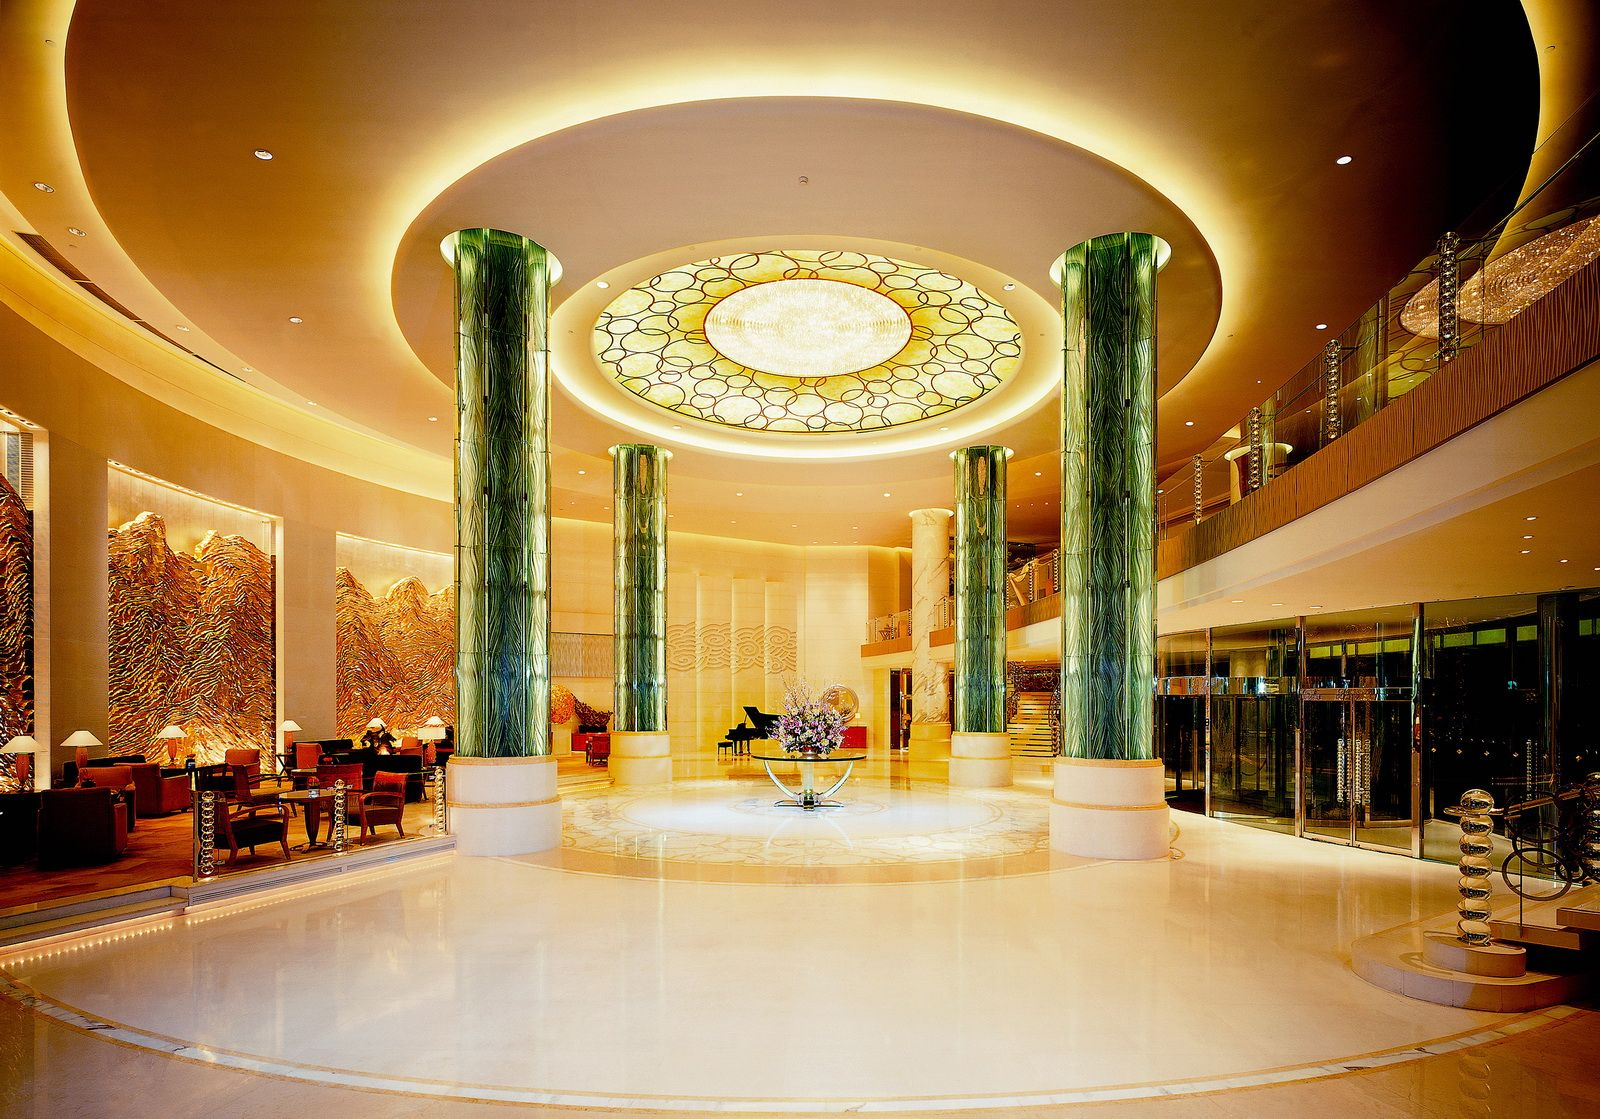 Lobby interior hotel lobby flooring ideas white flooring luxury hotels ceiling design skylights glass walls lobbies